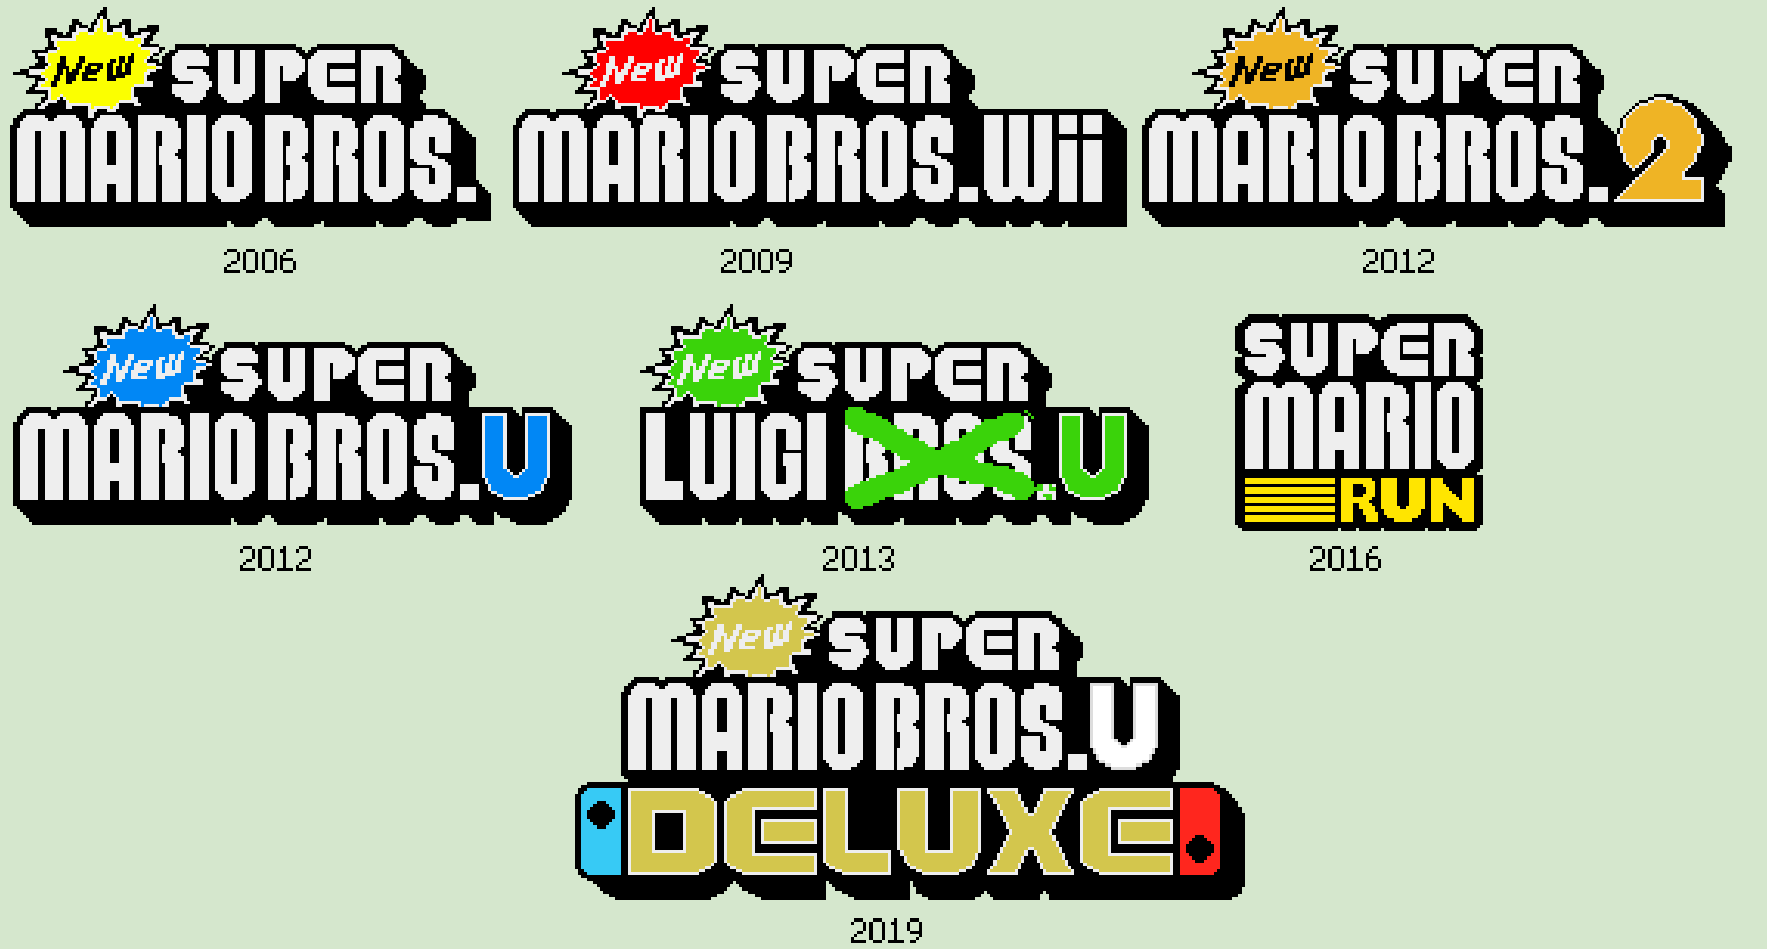 New Super Mario Bros Series Logos Updated Again By Mazecube24